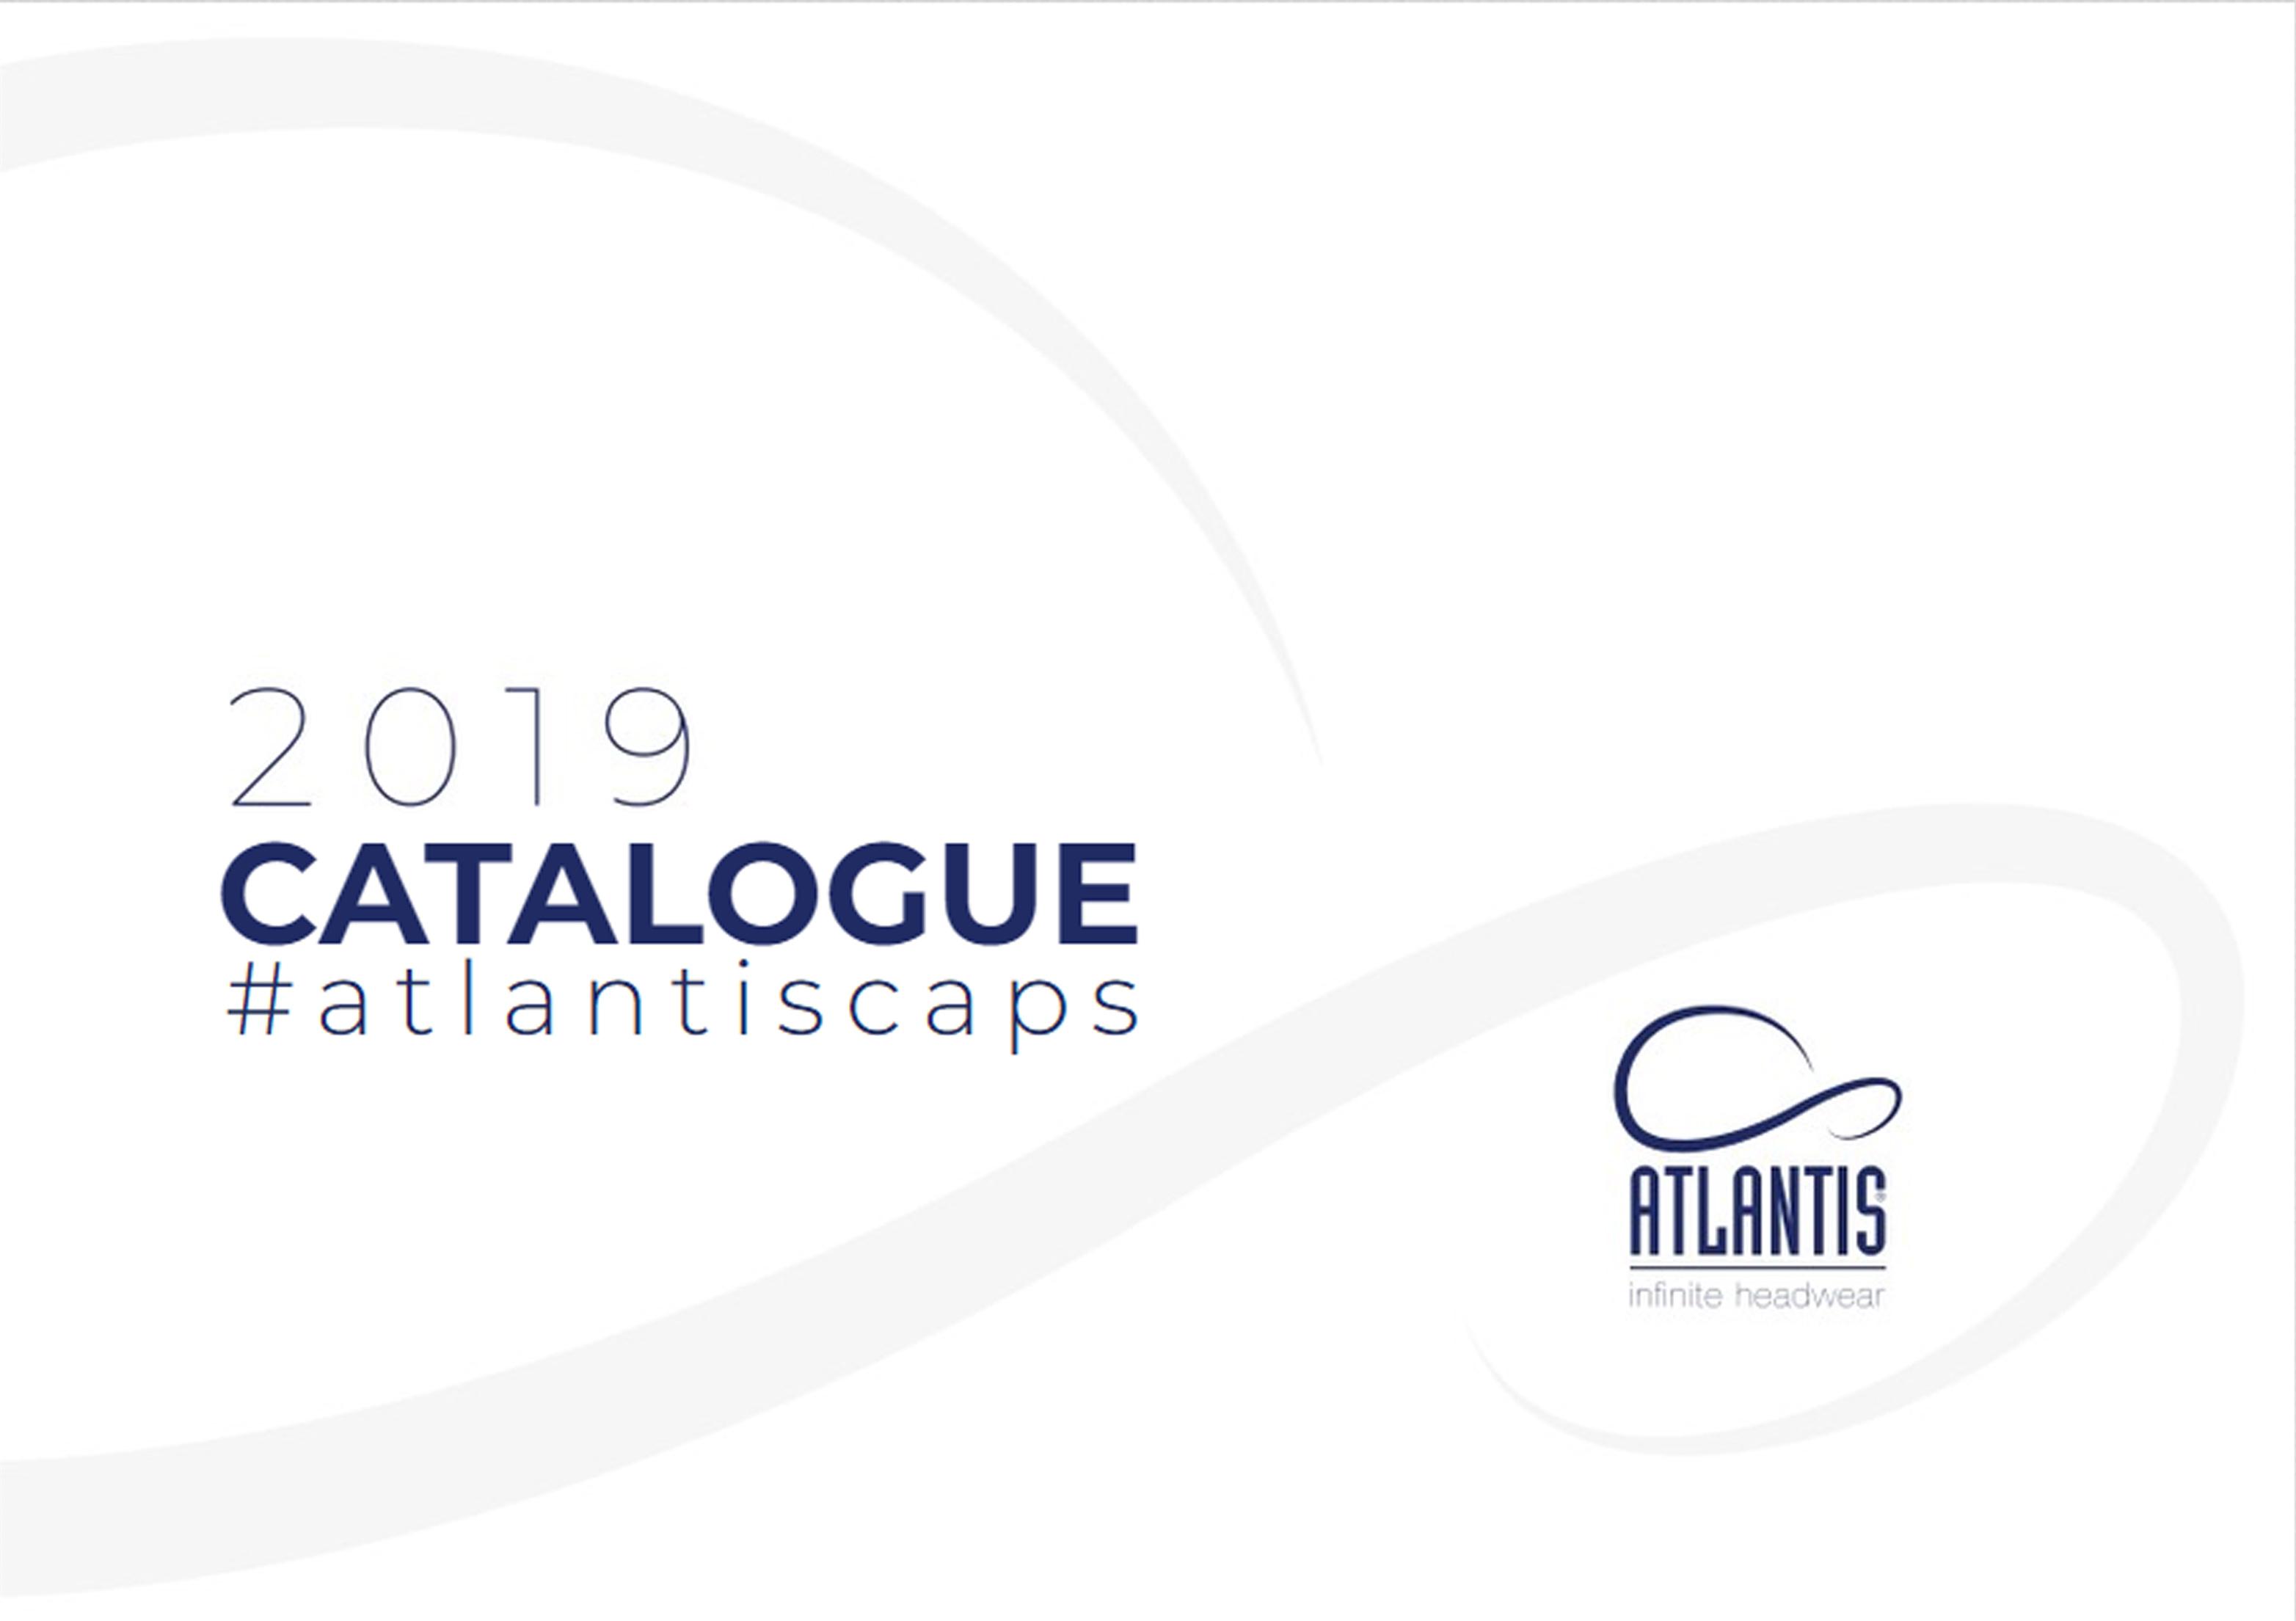 Atlantis 2019 lakkikuvasto